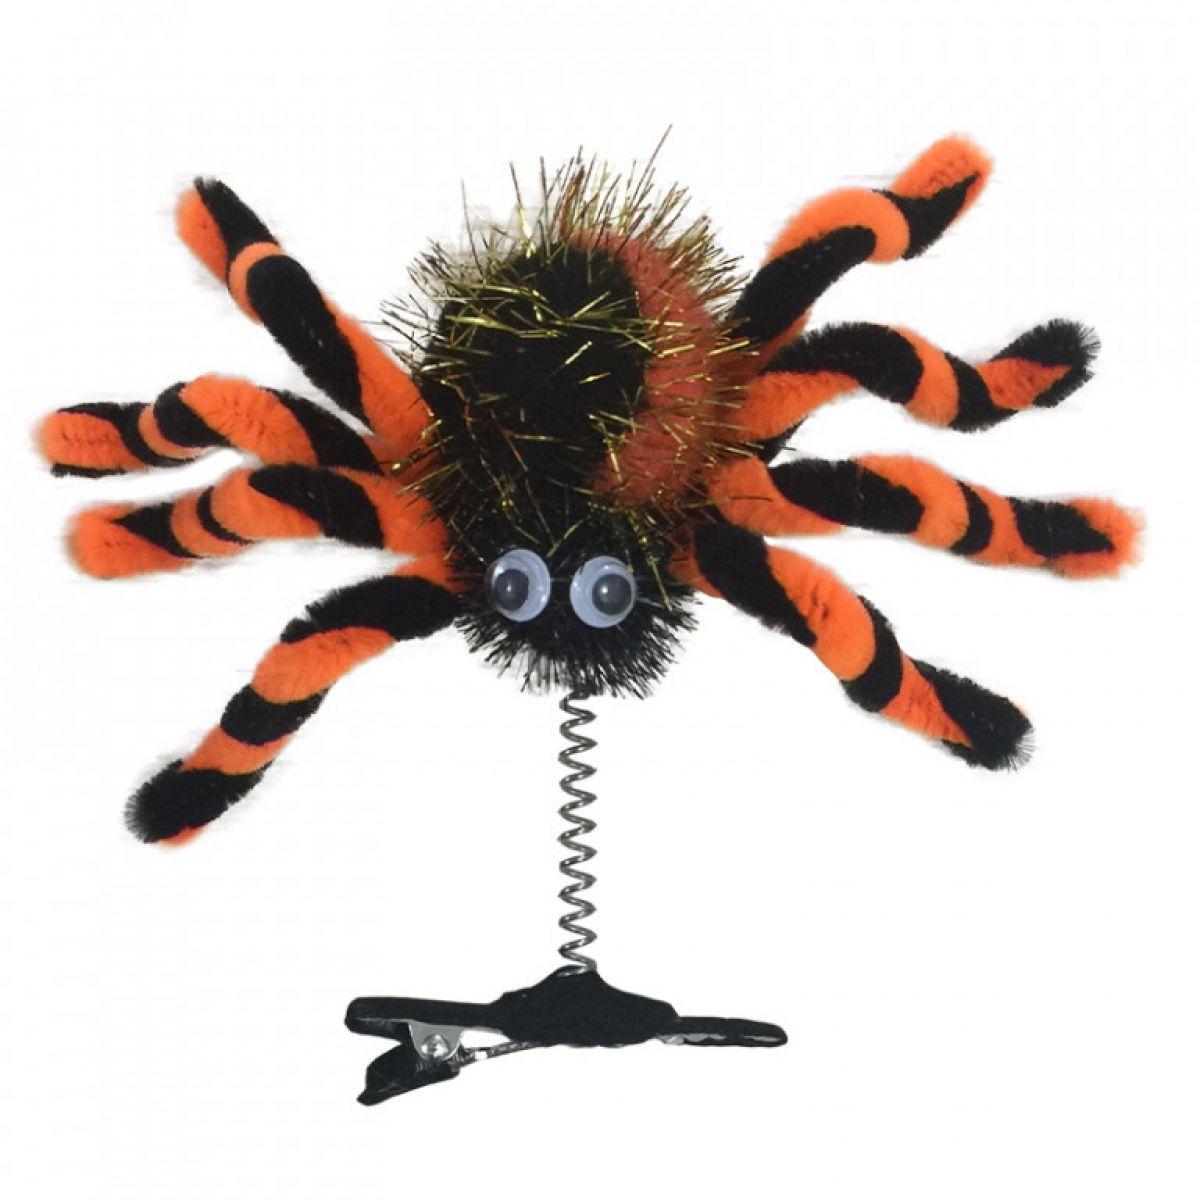 HM Studio Spona do vlasů pavouk